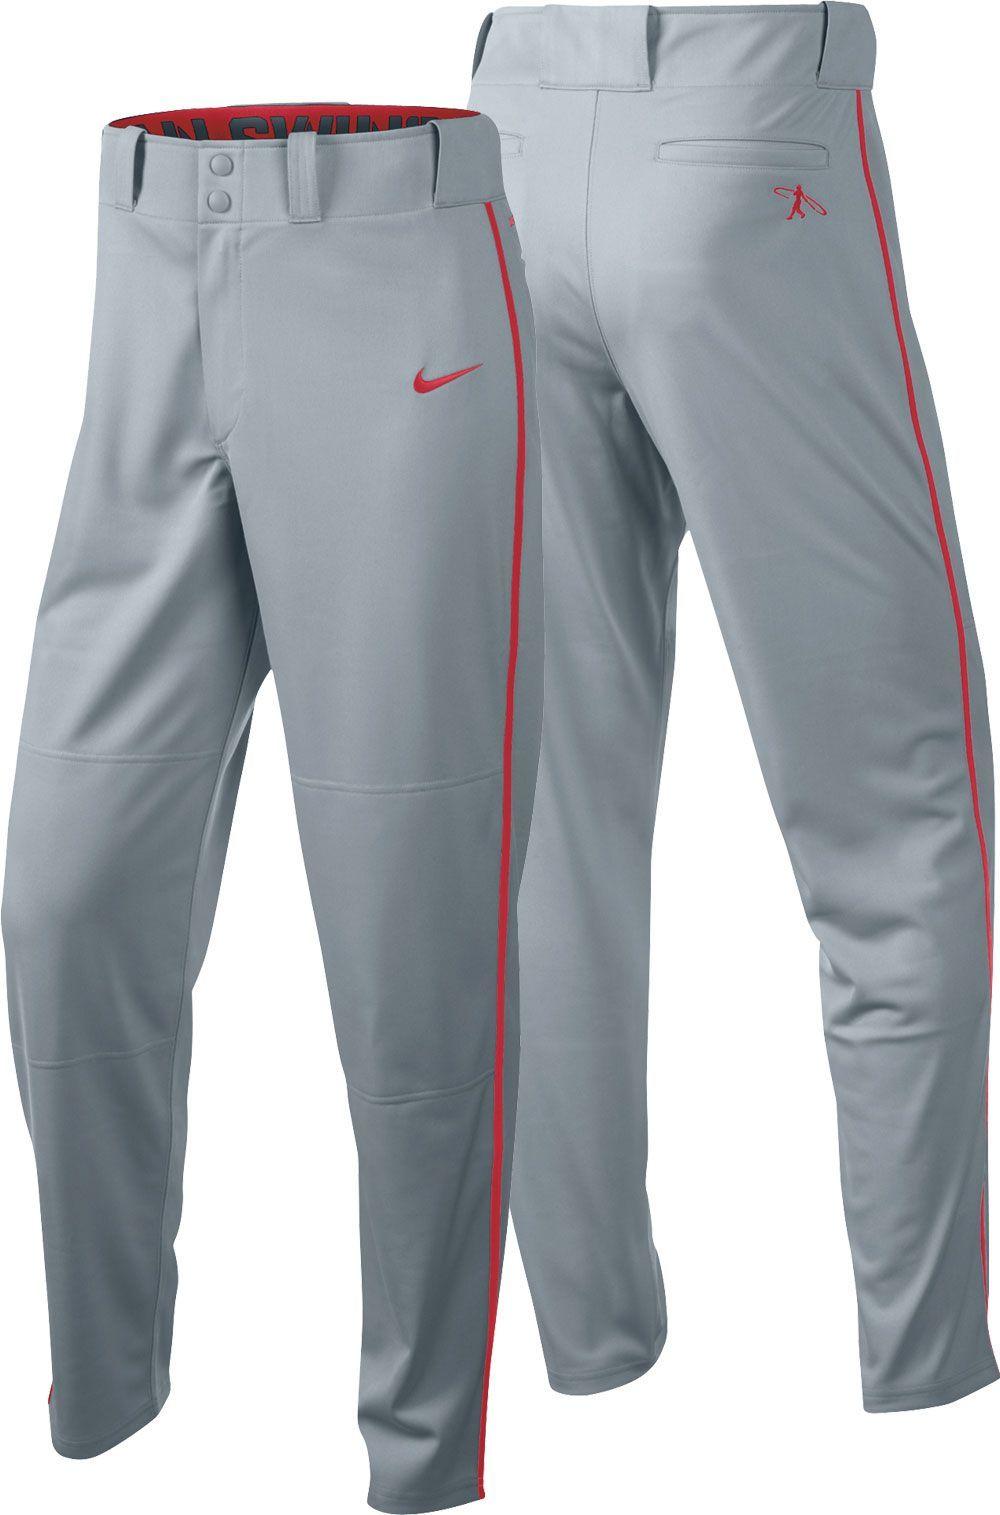 Nike Boys' Swingman Dri FIT Piped Baseball Pants, Size